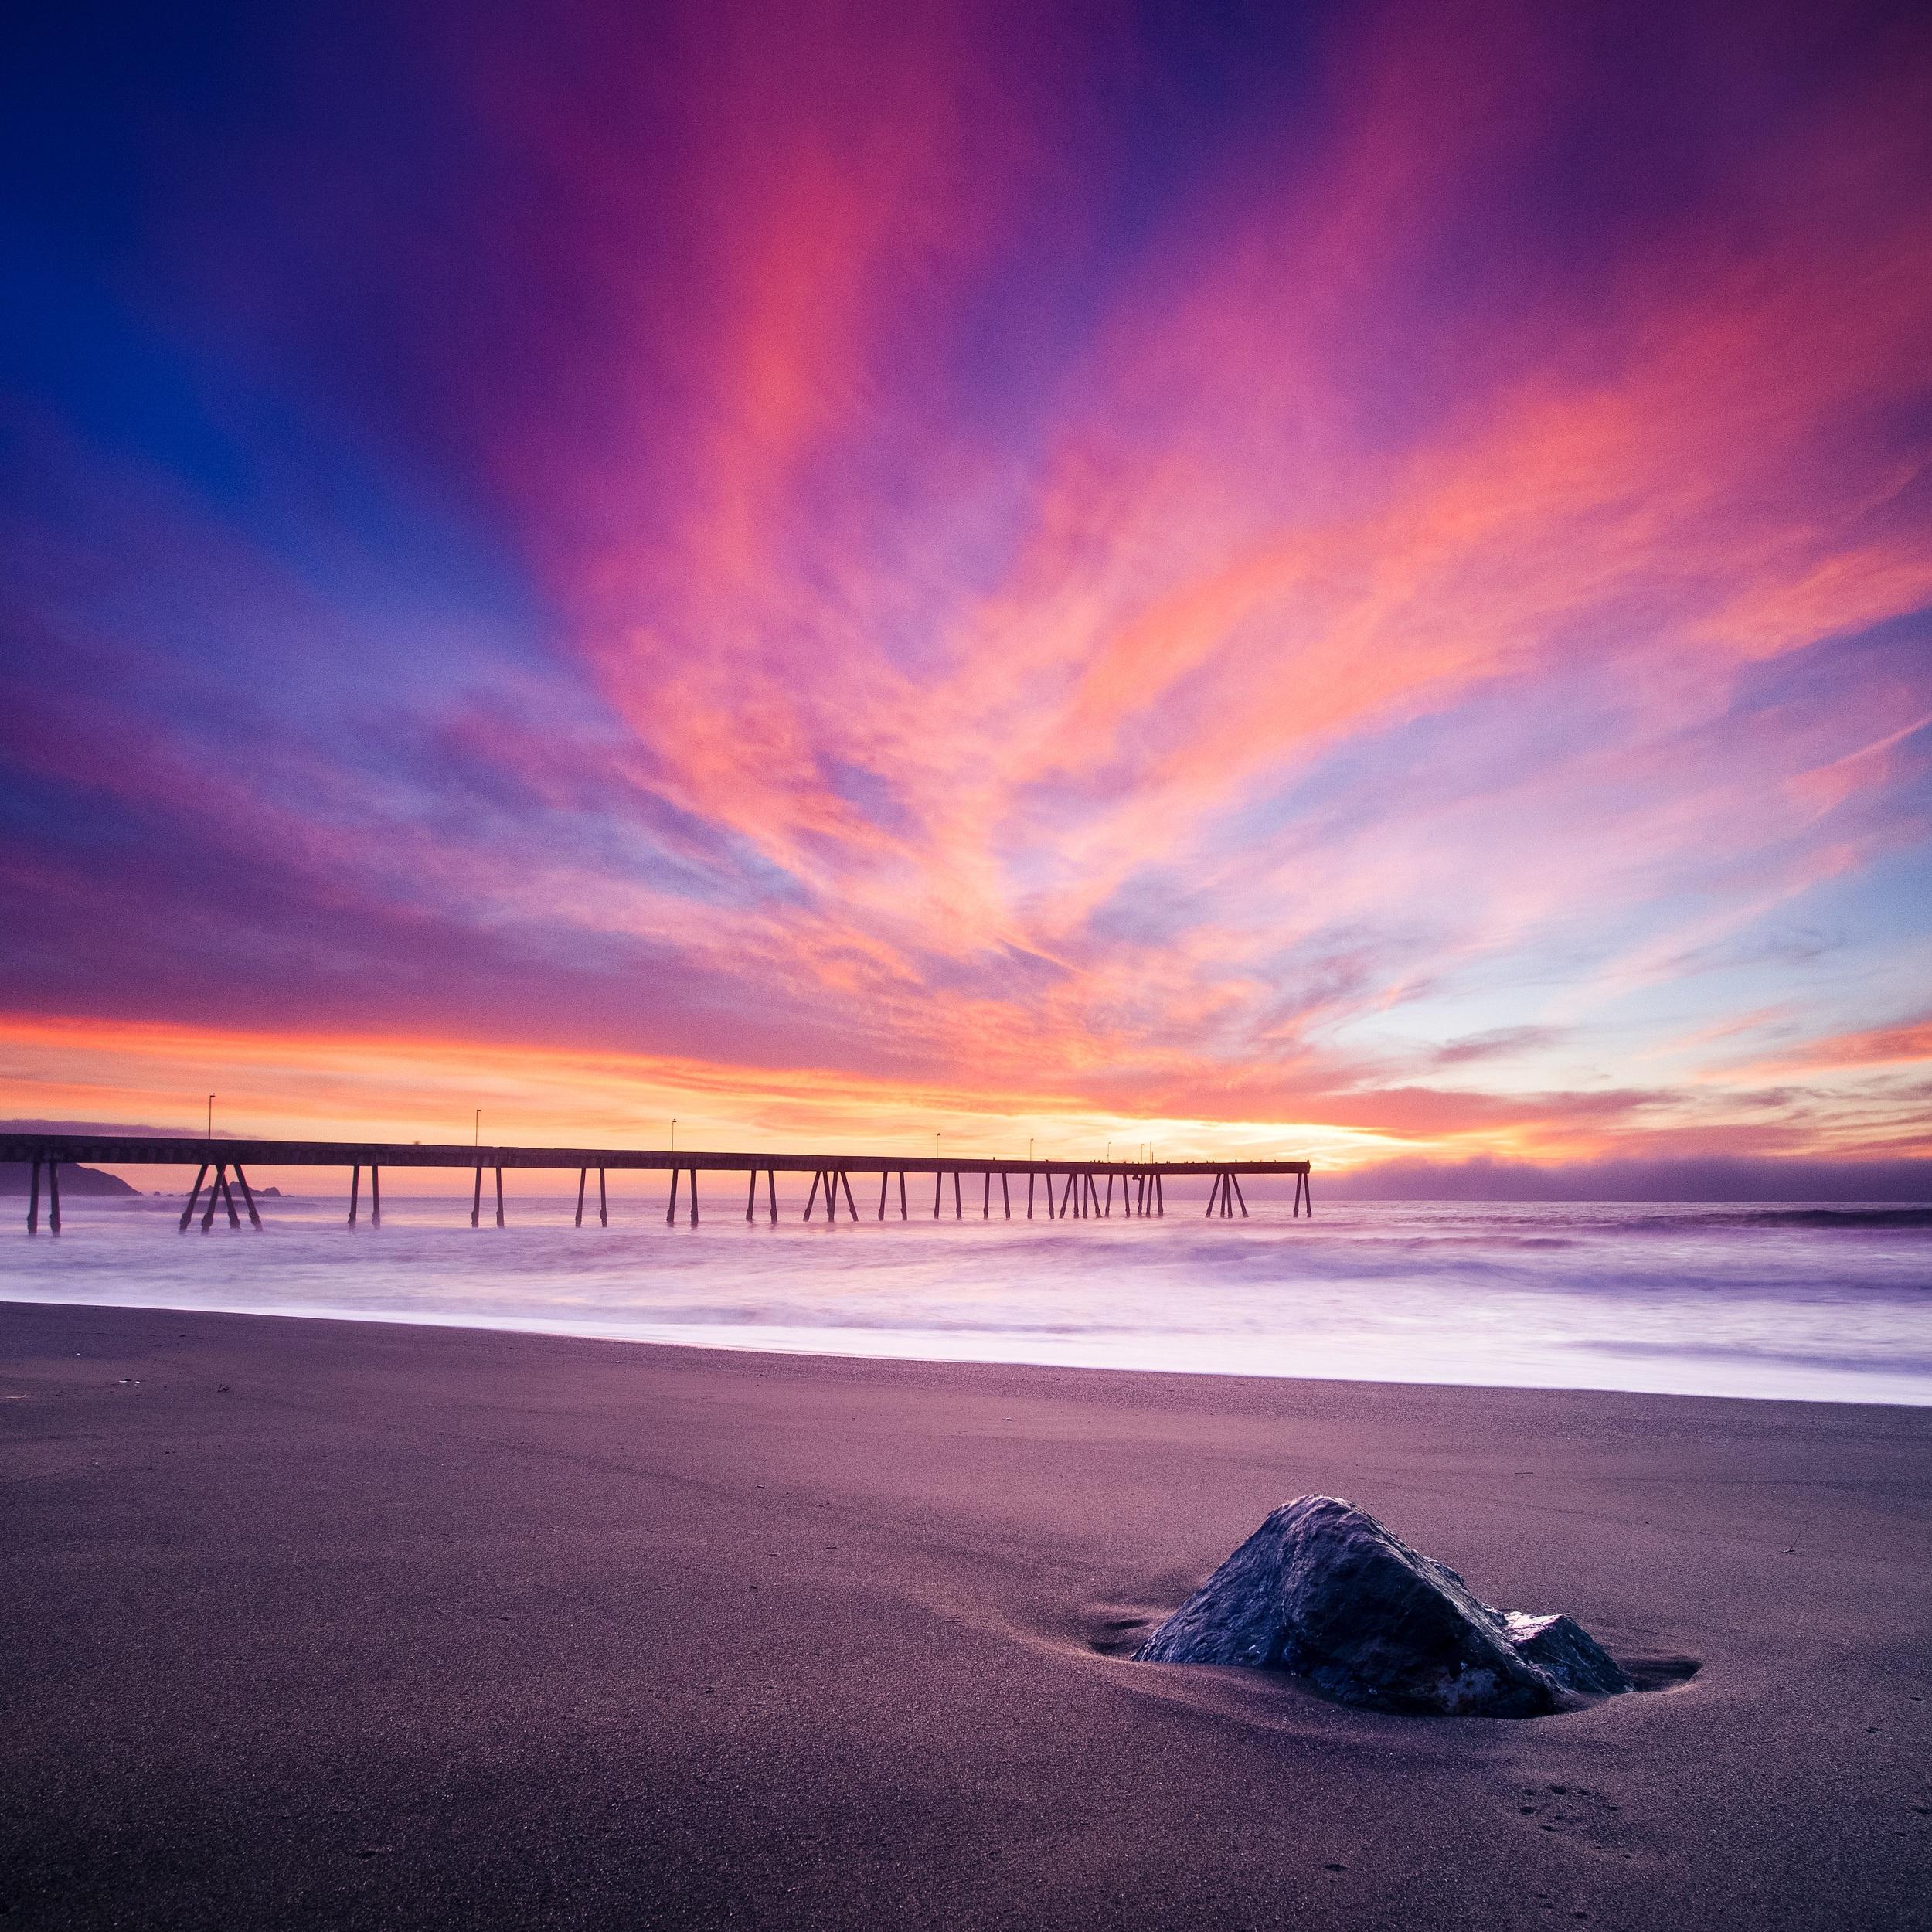 Pacifica pier sunset pastel explosion